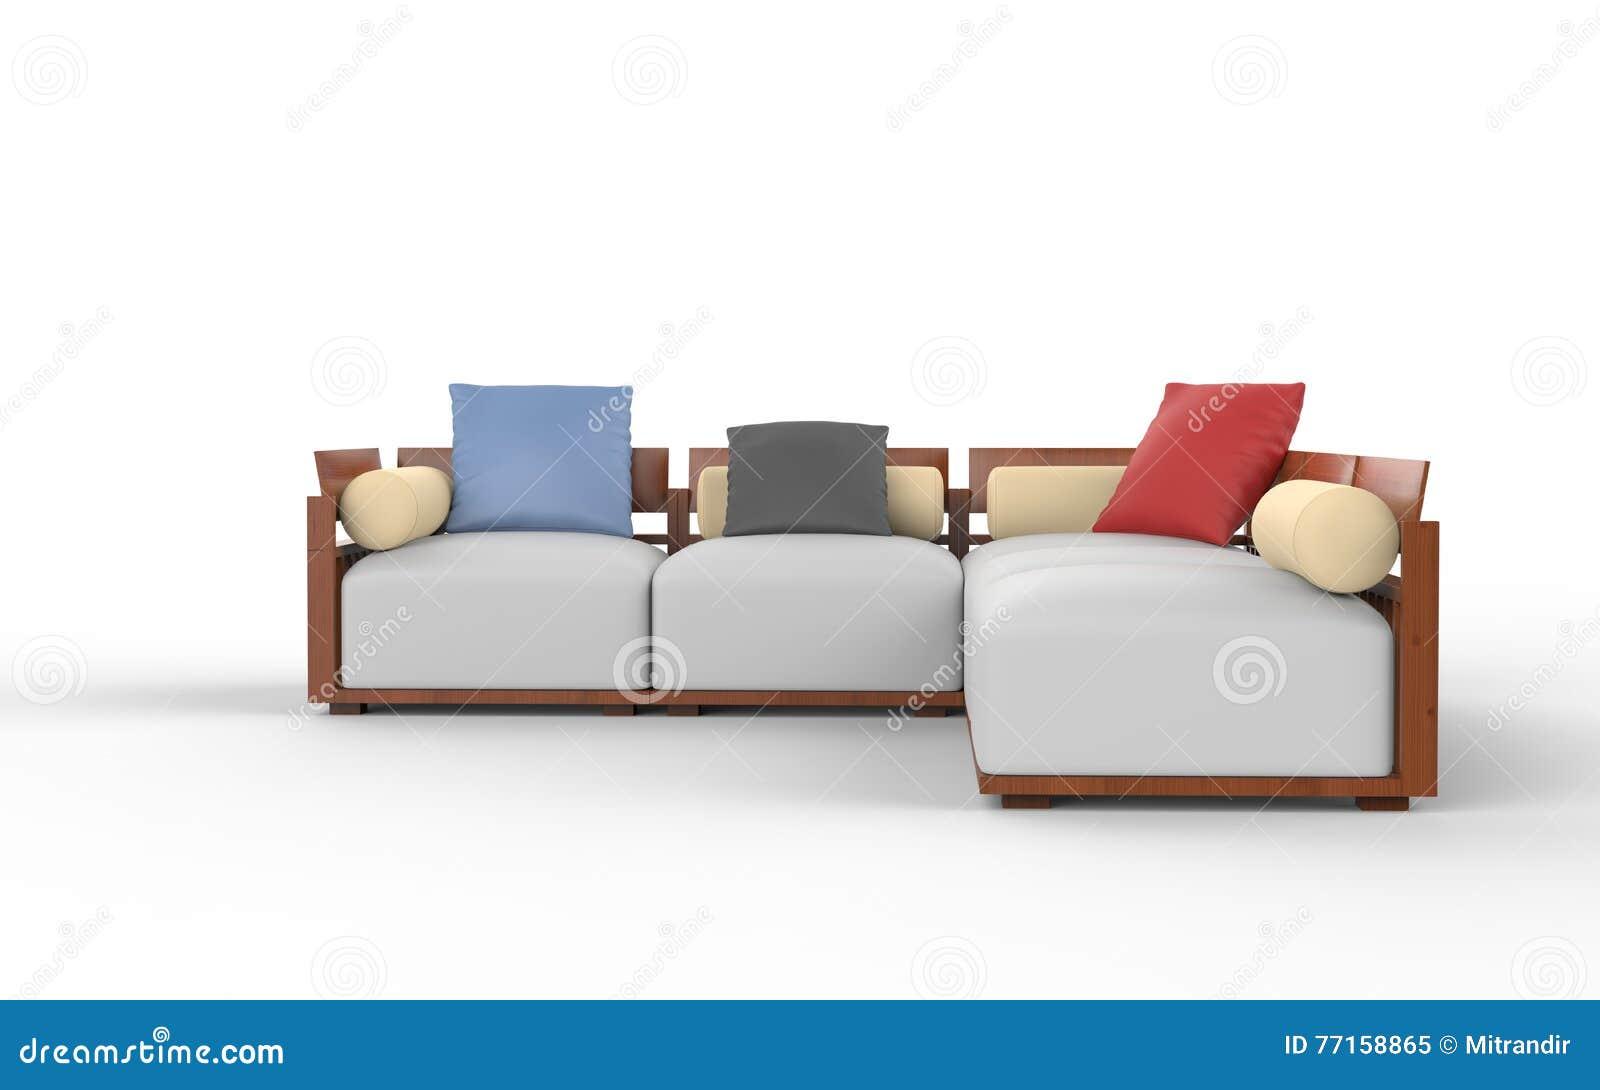 Amazing Stylish Modern Corner Furniture Set Stock Illustration Interior Design Ideas Gentotryabchikinfo